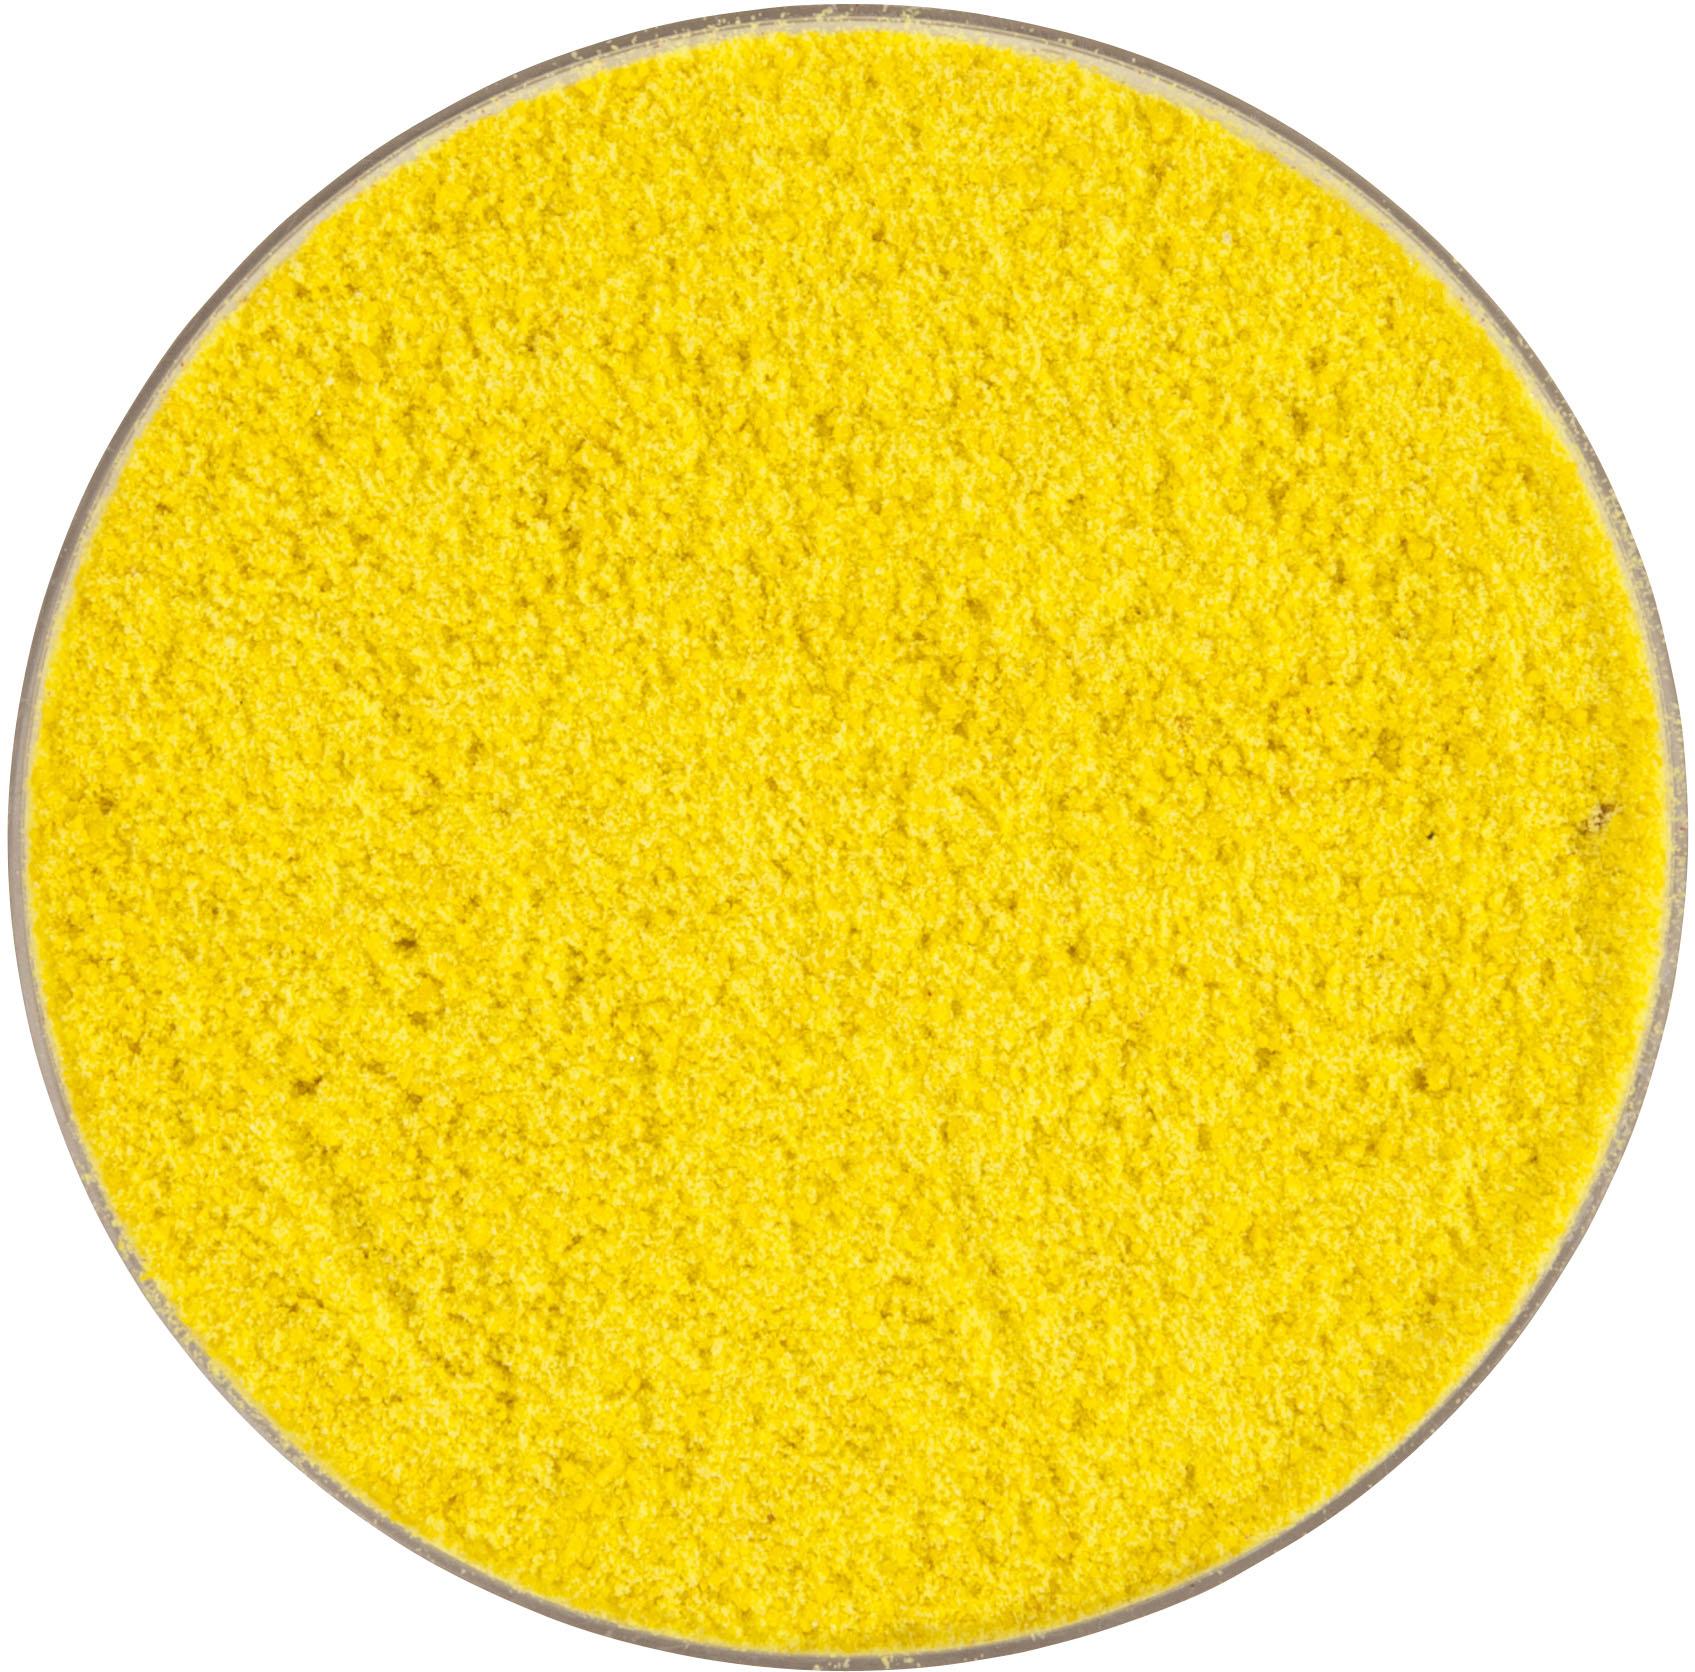 Přísada do krmení MS Range Pastoncino red / yellow Barva žlutá